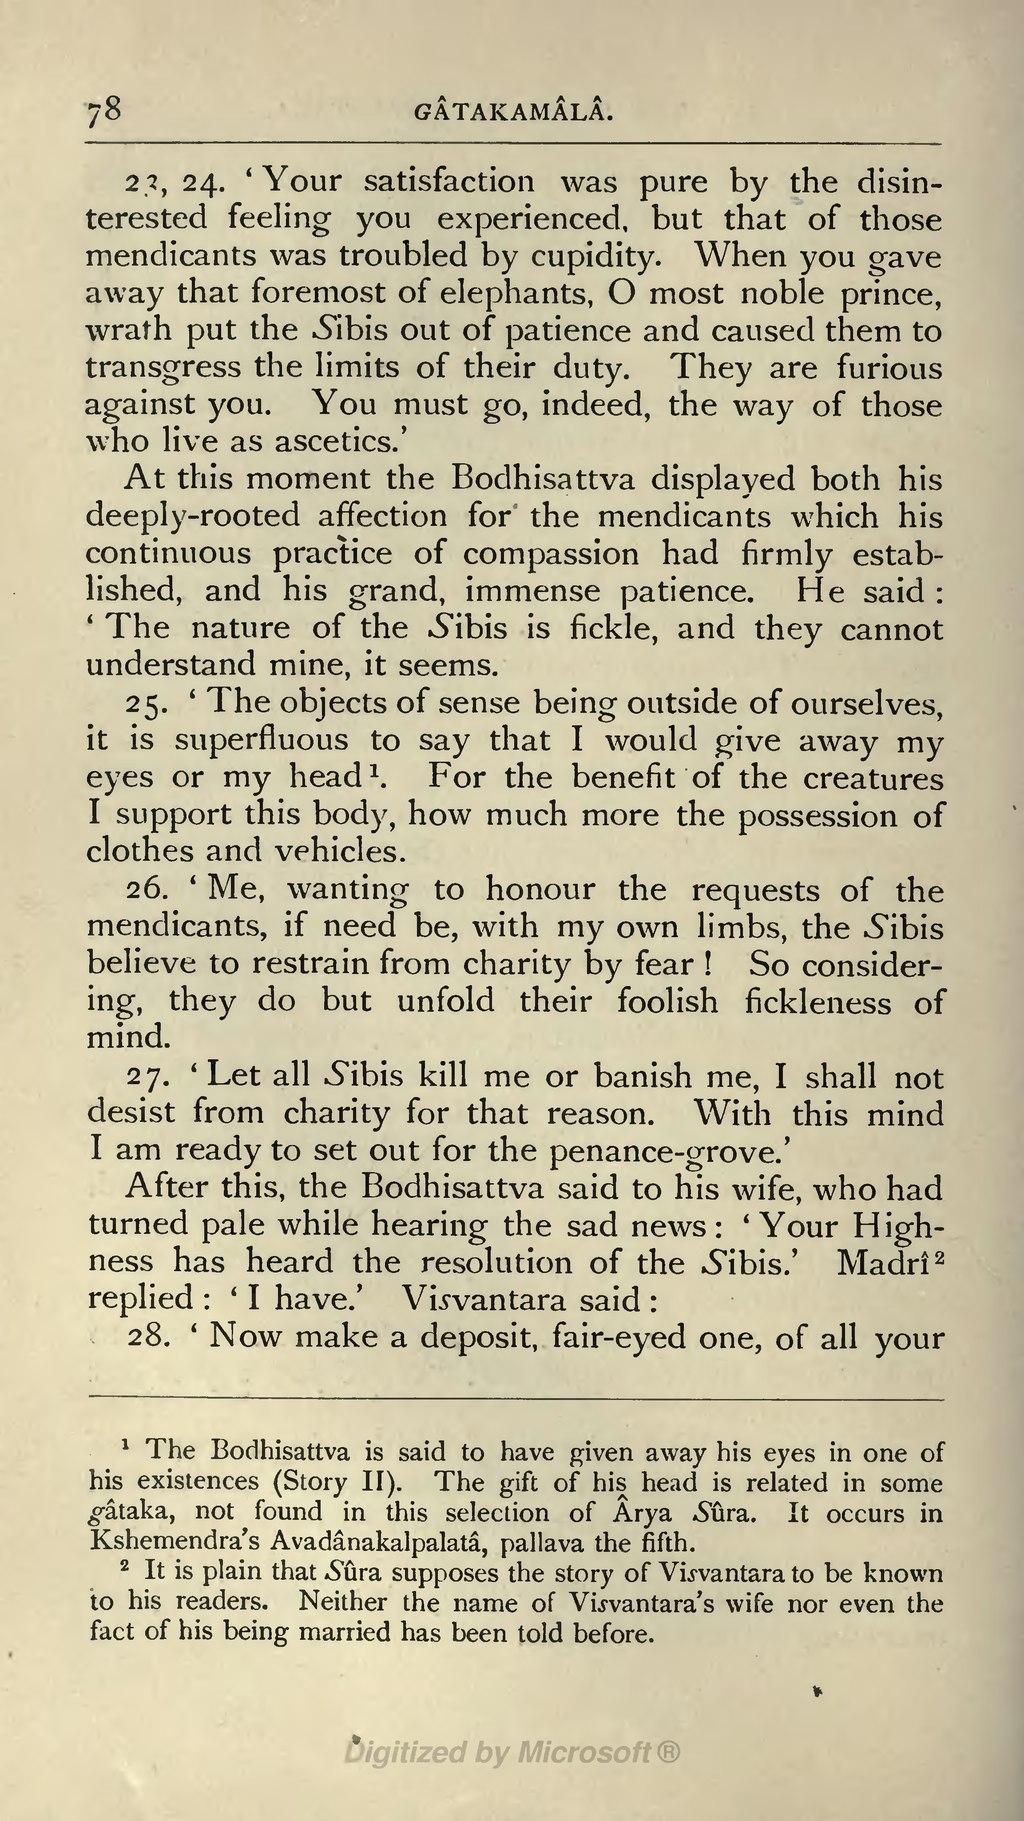 1984 Book 2 Chapter 5 Summary Lord Yinacihiyoml